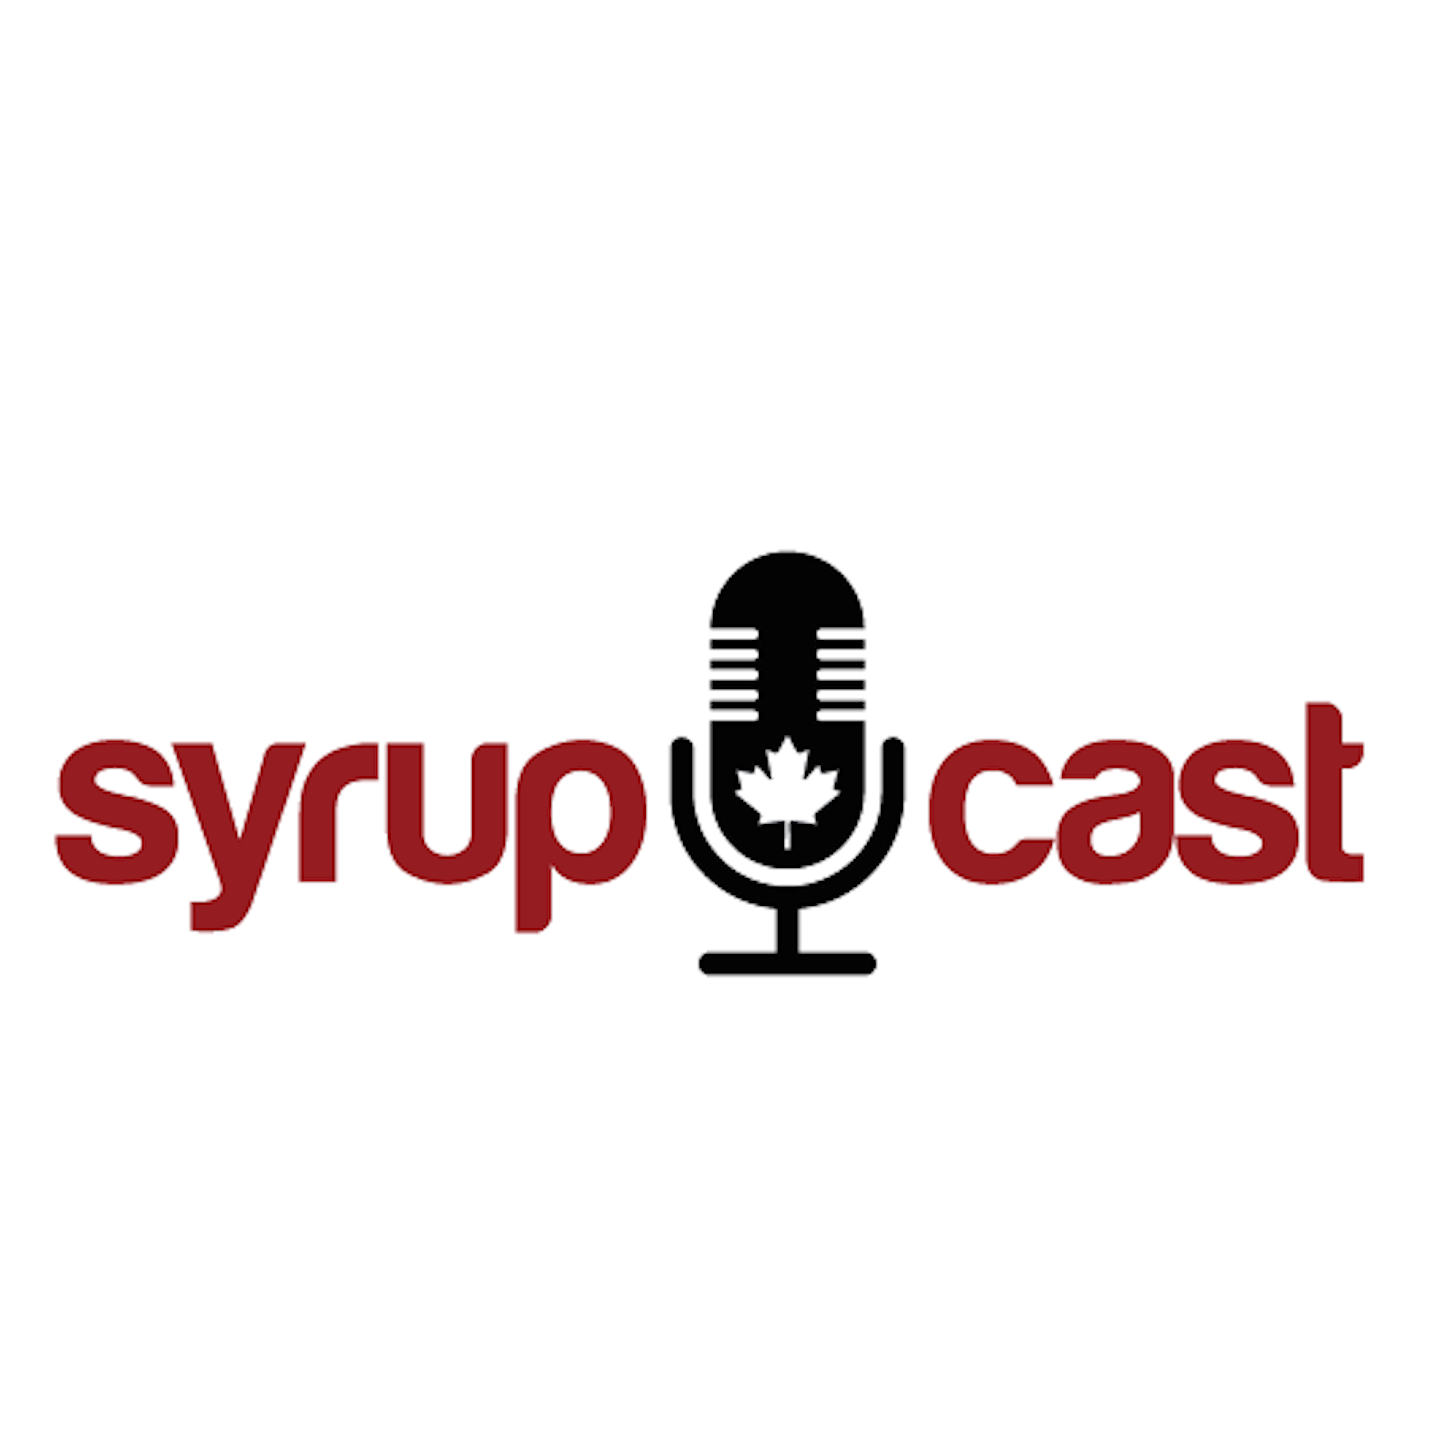 SyrupCast 85: Modular regrets